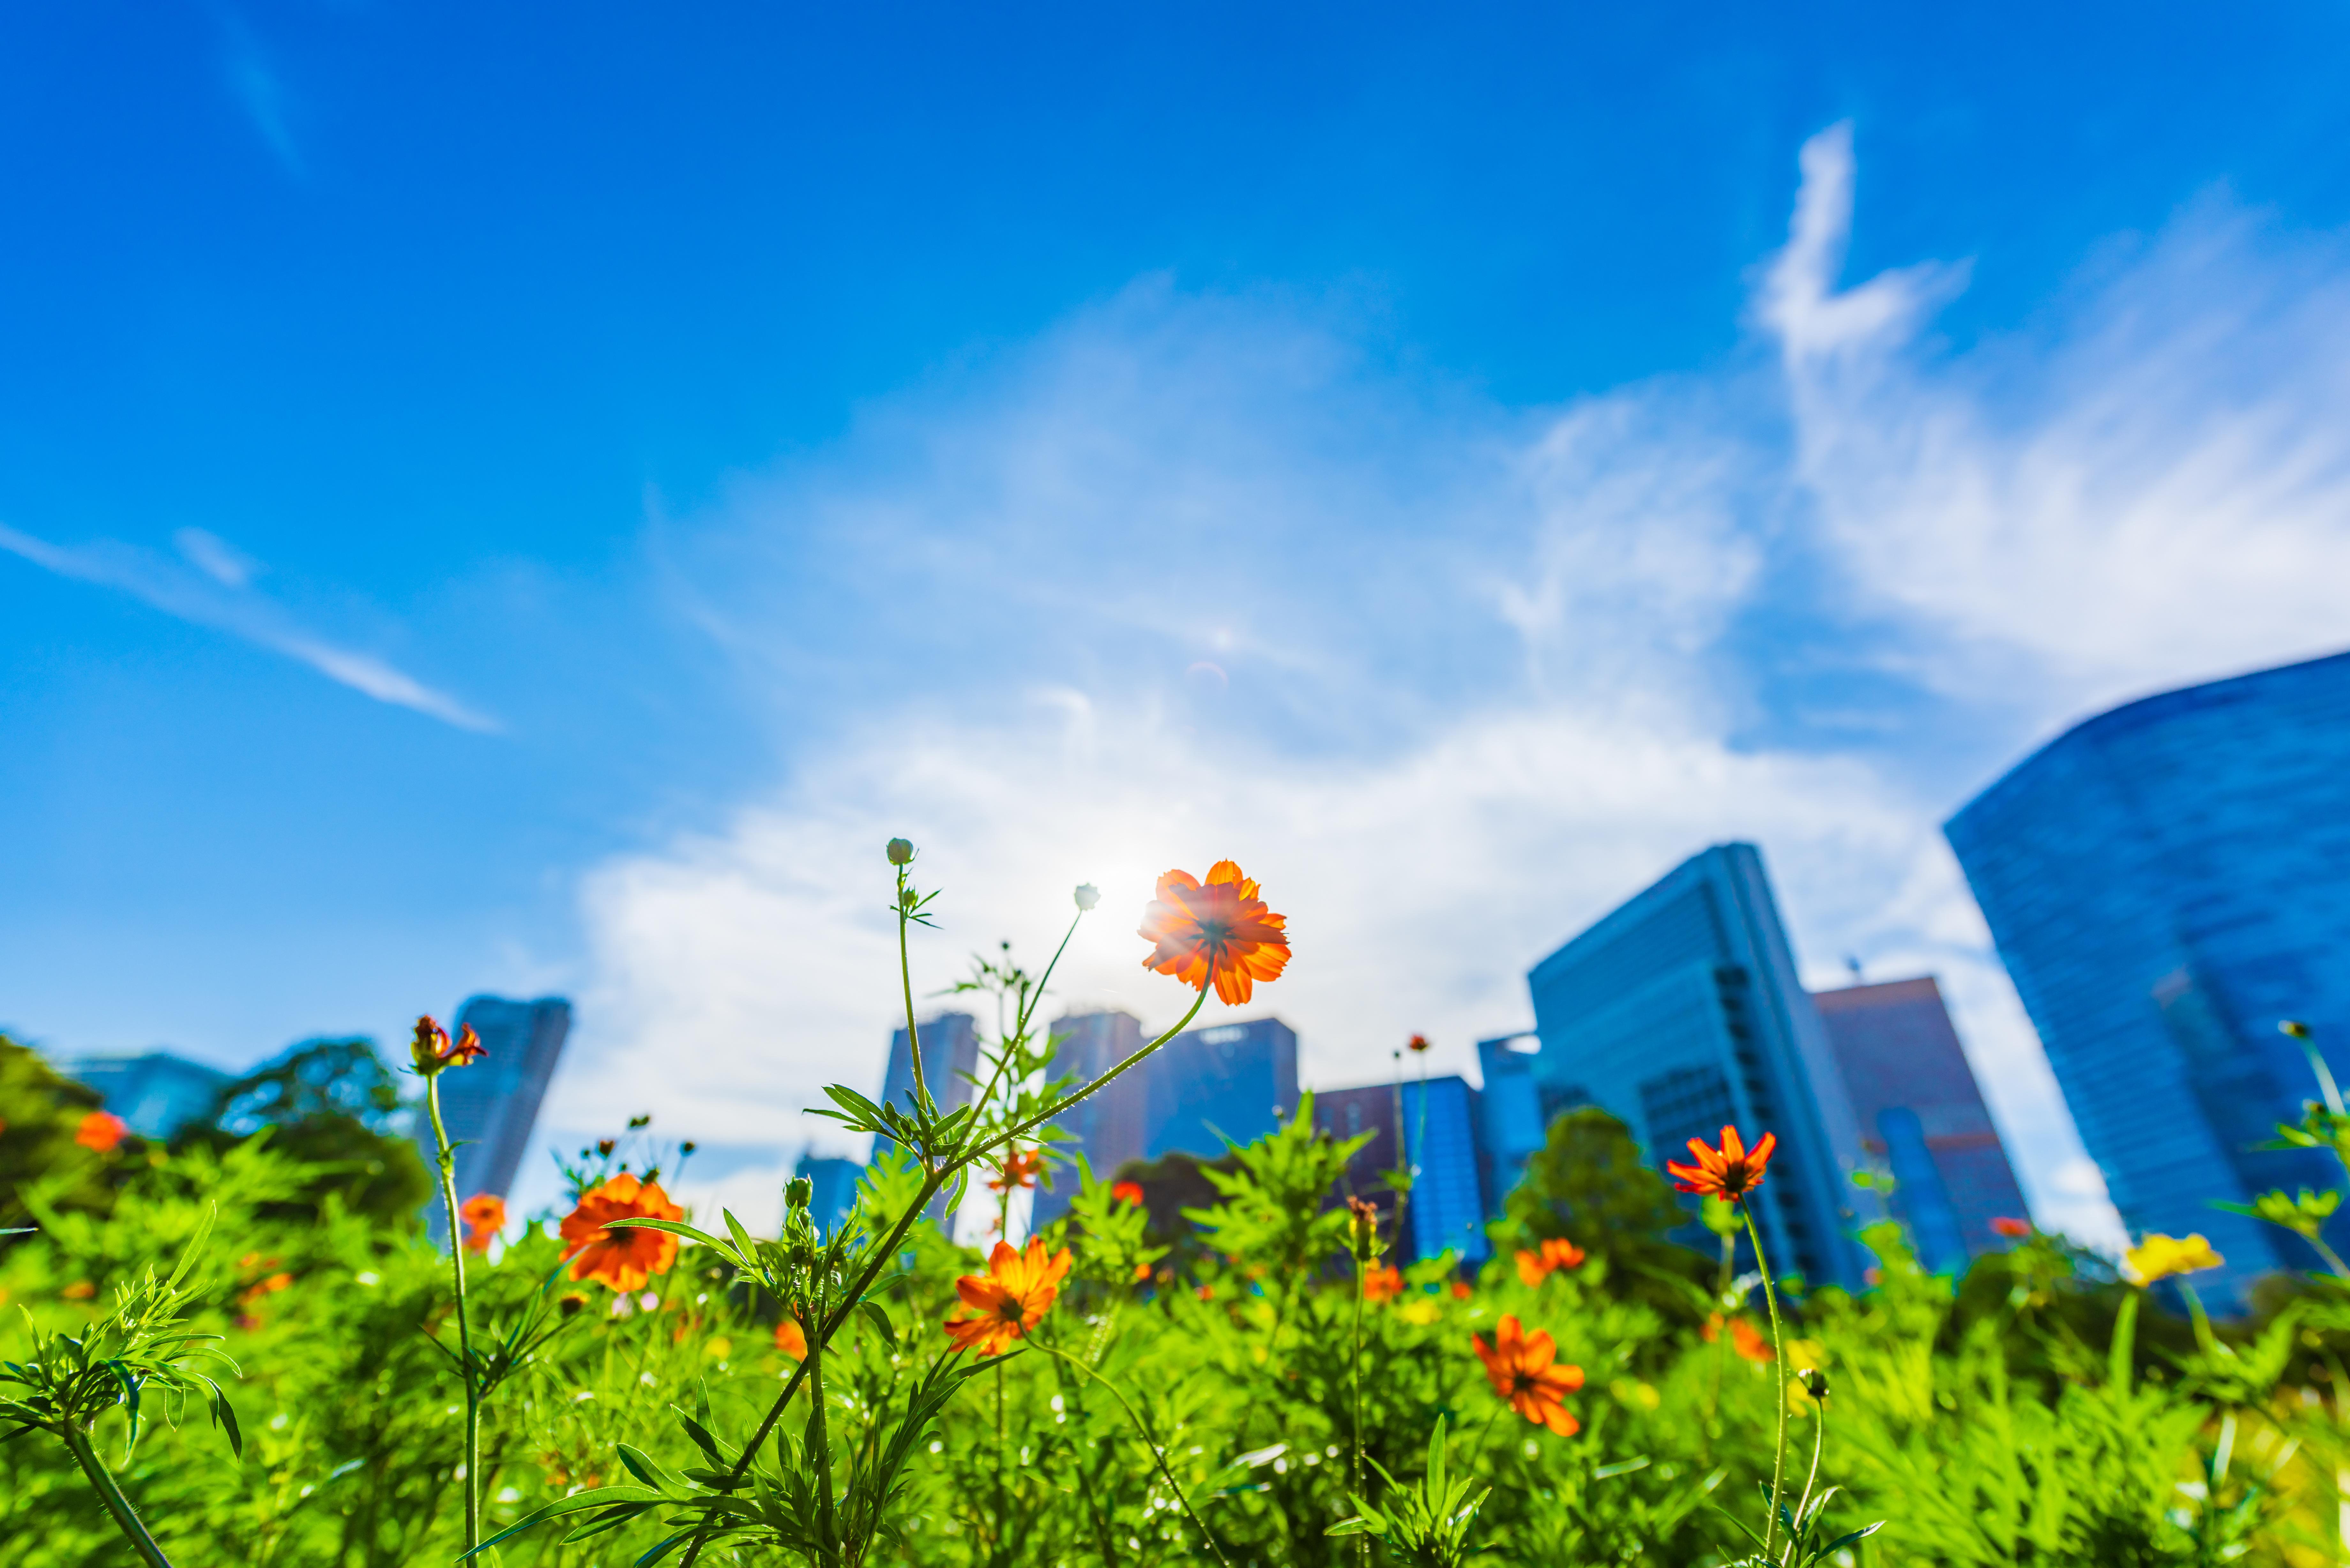 RE100メンバー会に参加し、日本における再生可能エネルギーの普及を促進